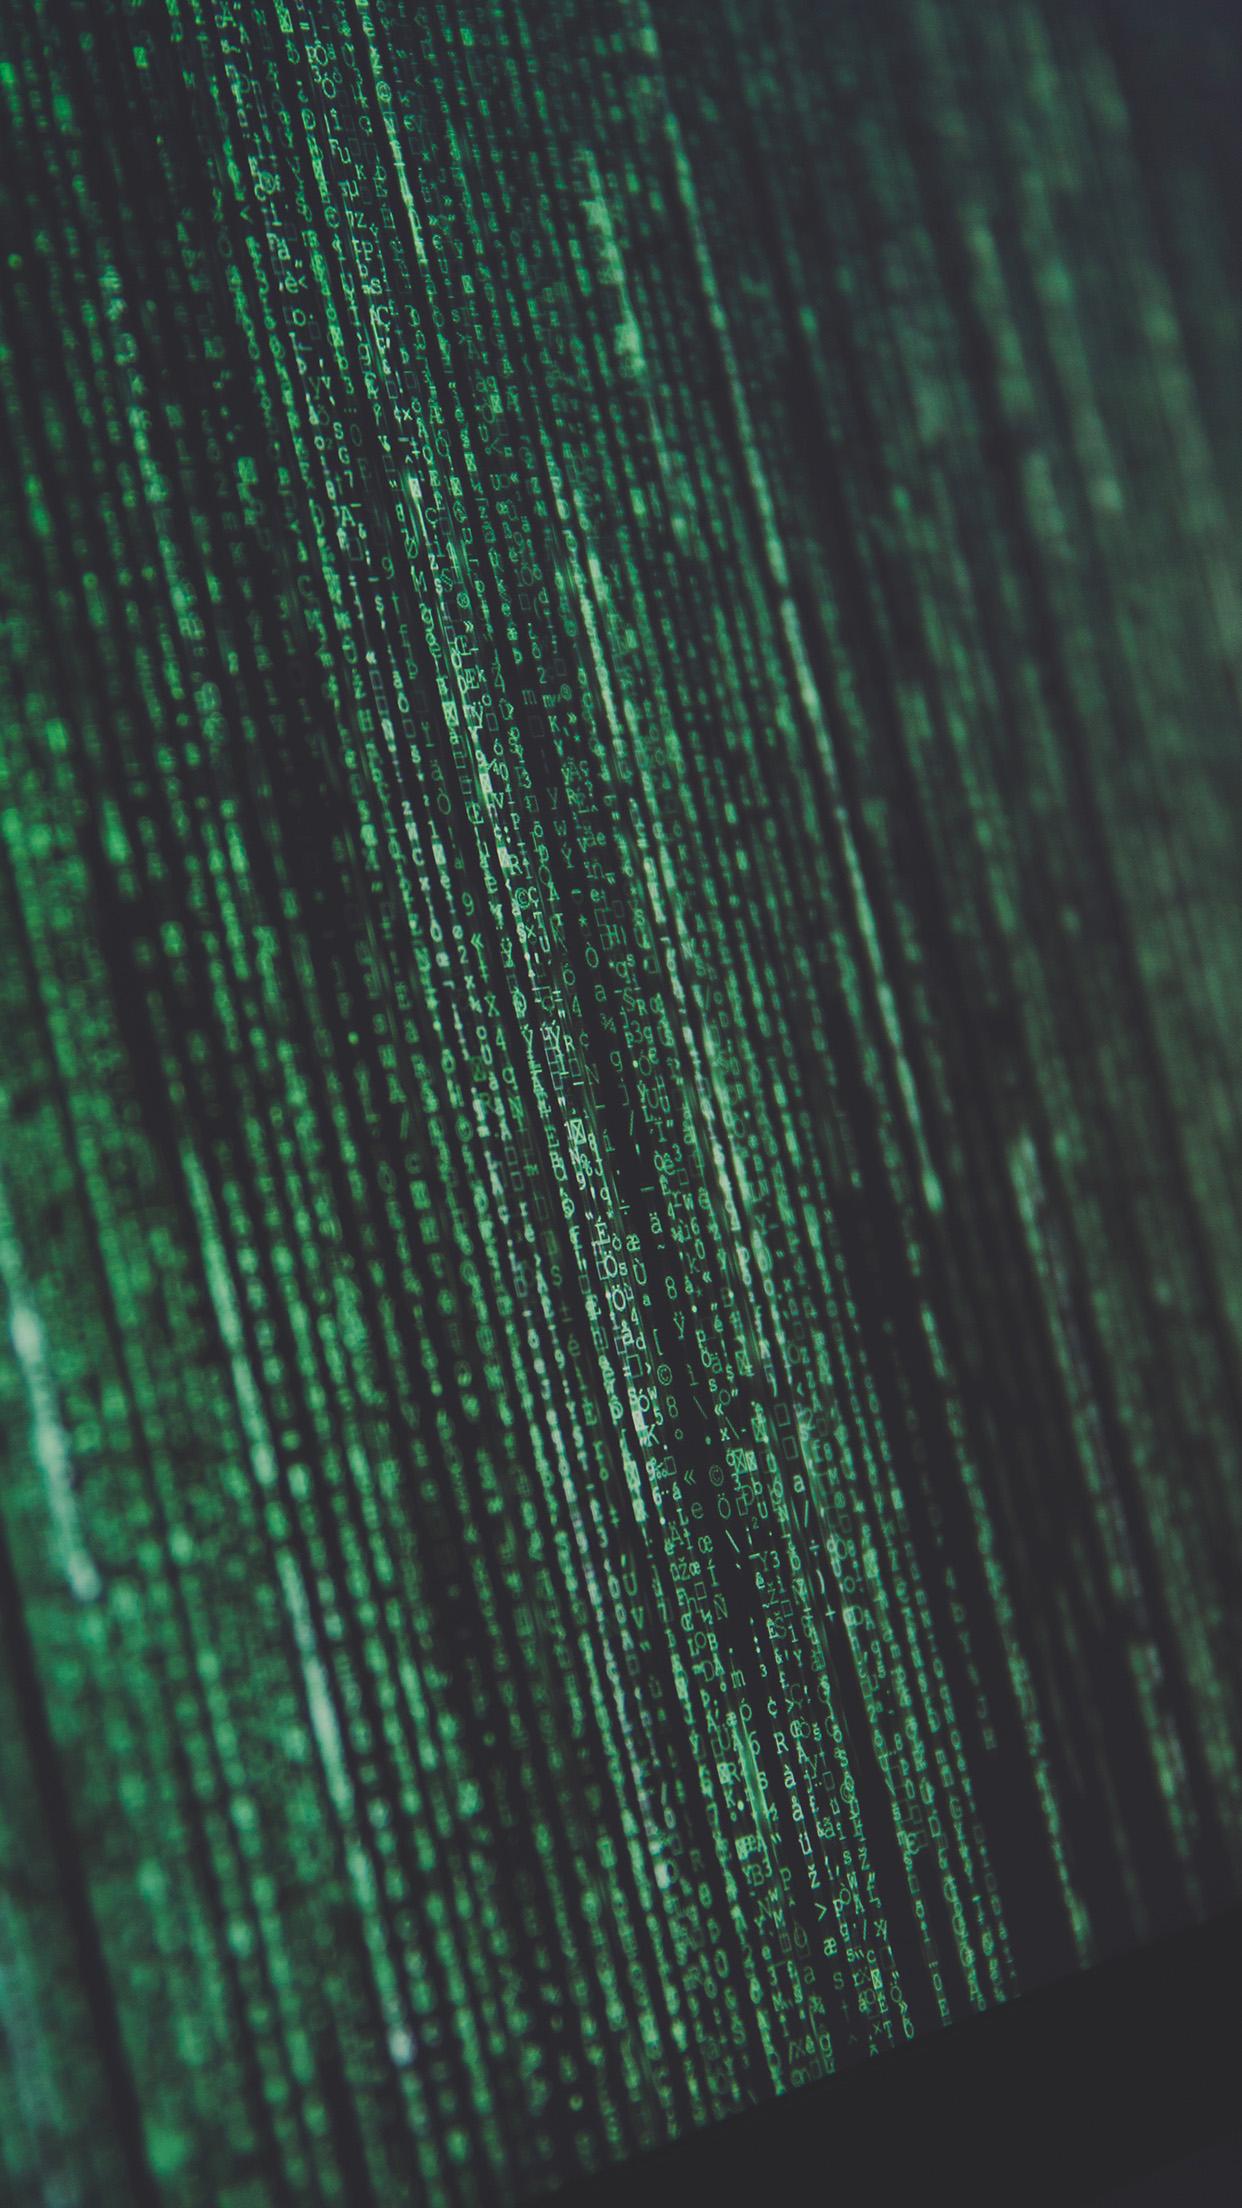 Nm91 Matrix Minimal Coding Screen Computer Green Dark Wallpaper